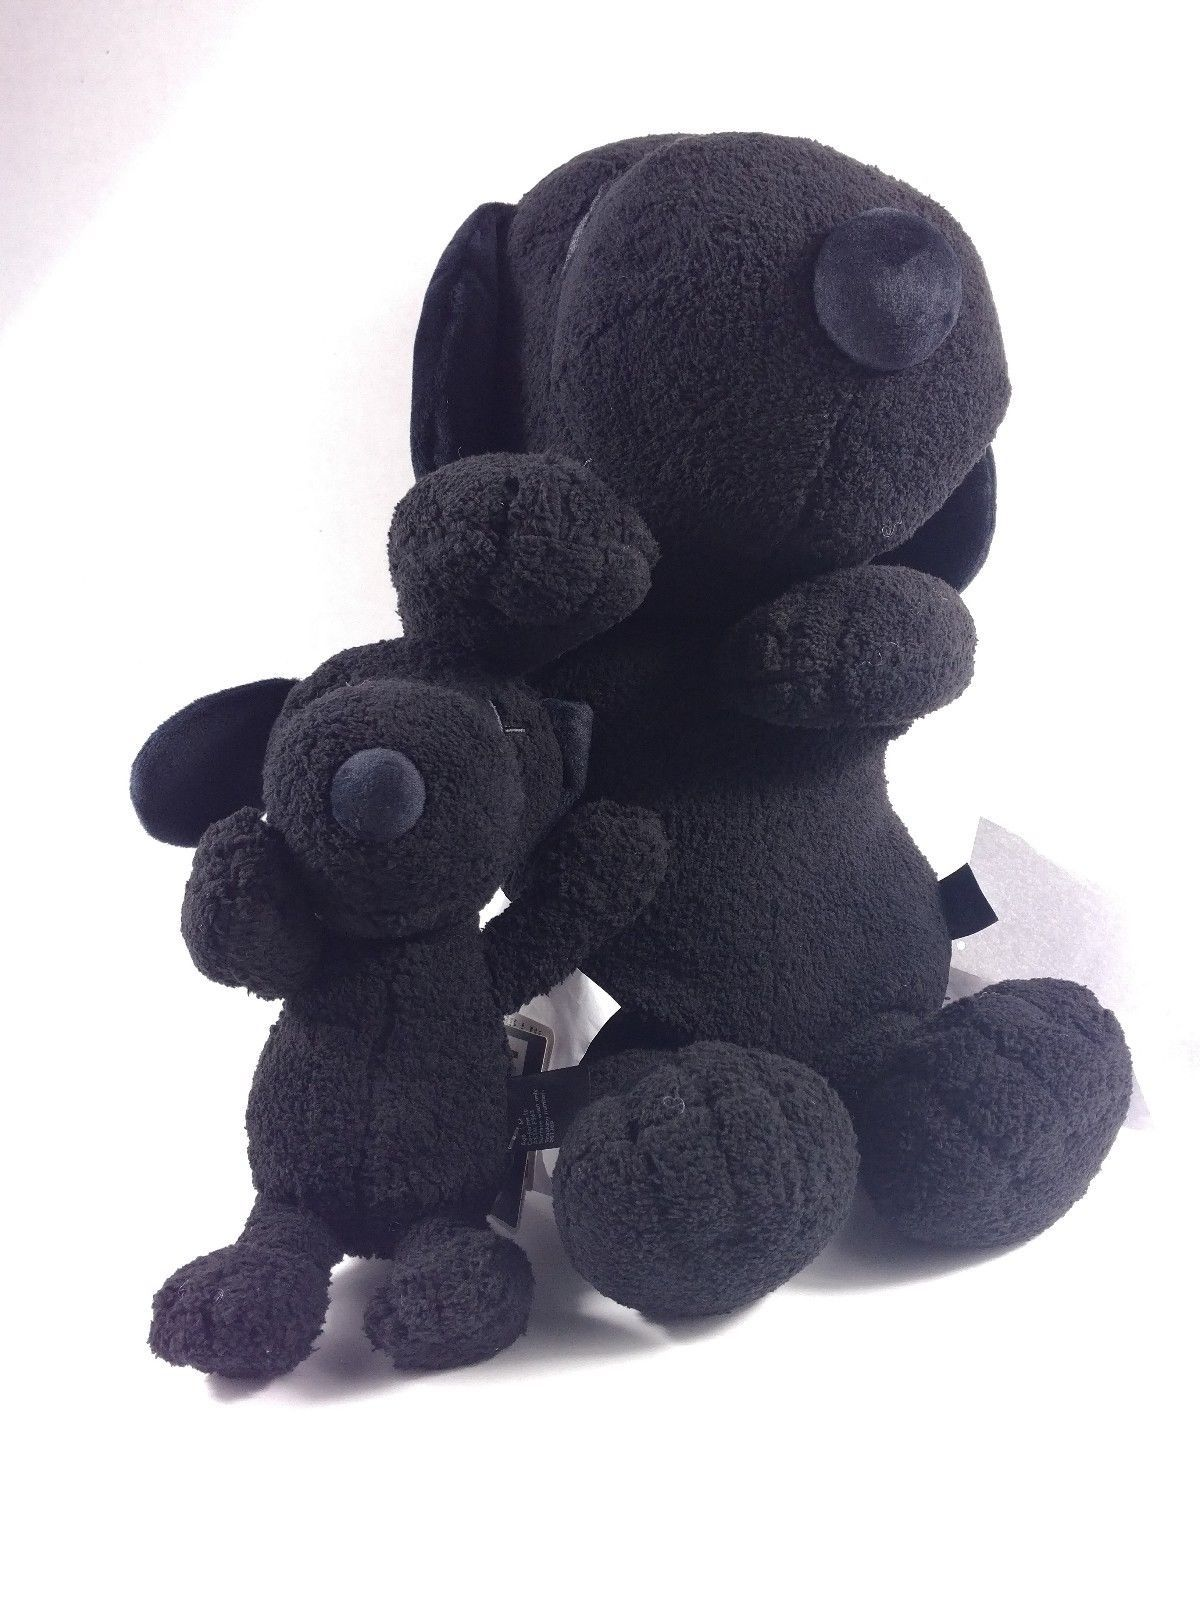 "Kaws x Peanuts x Uniqlo Black Snoopy Plush Toy Size Large 22/"" Brand New Limited"